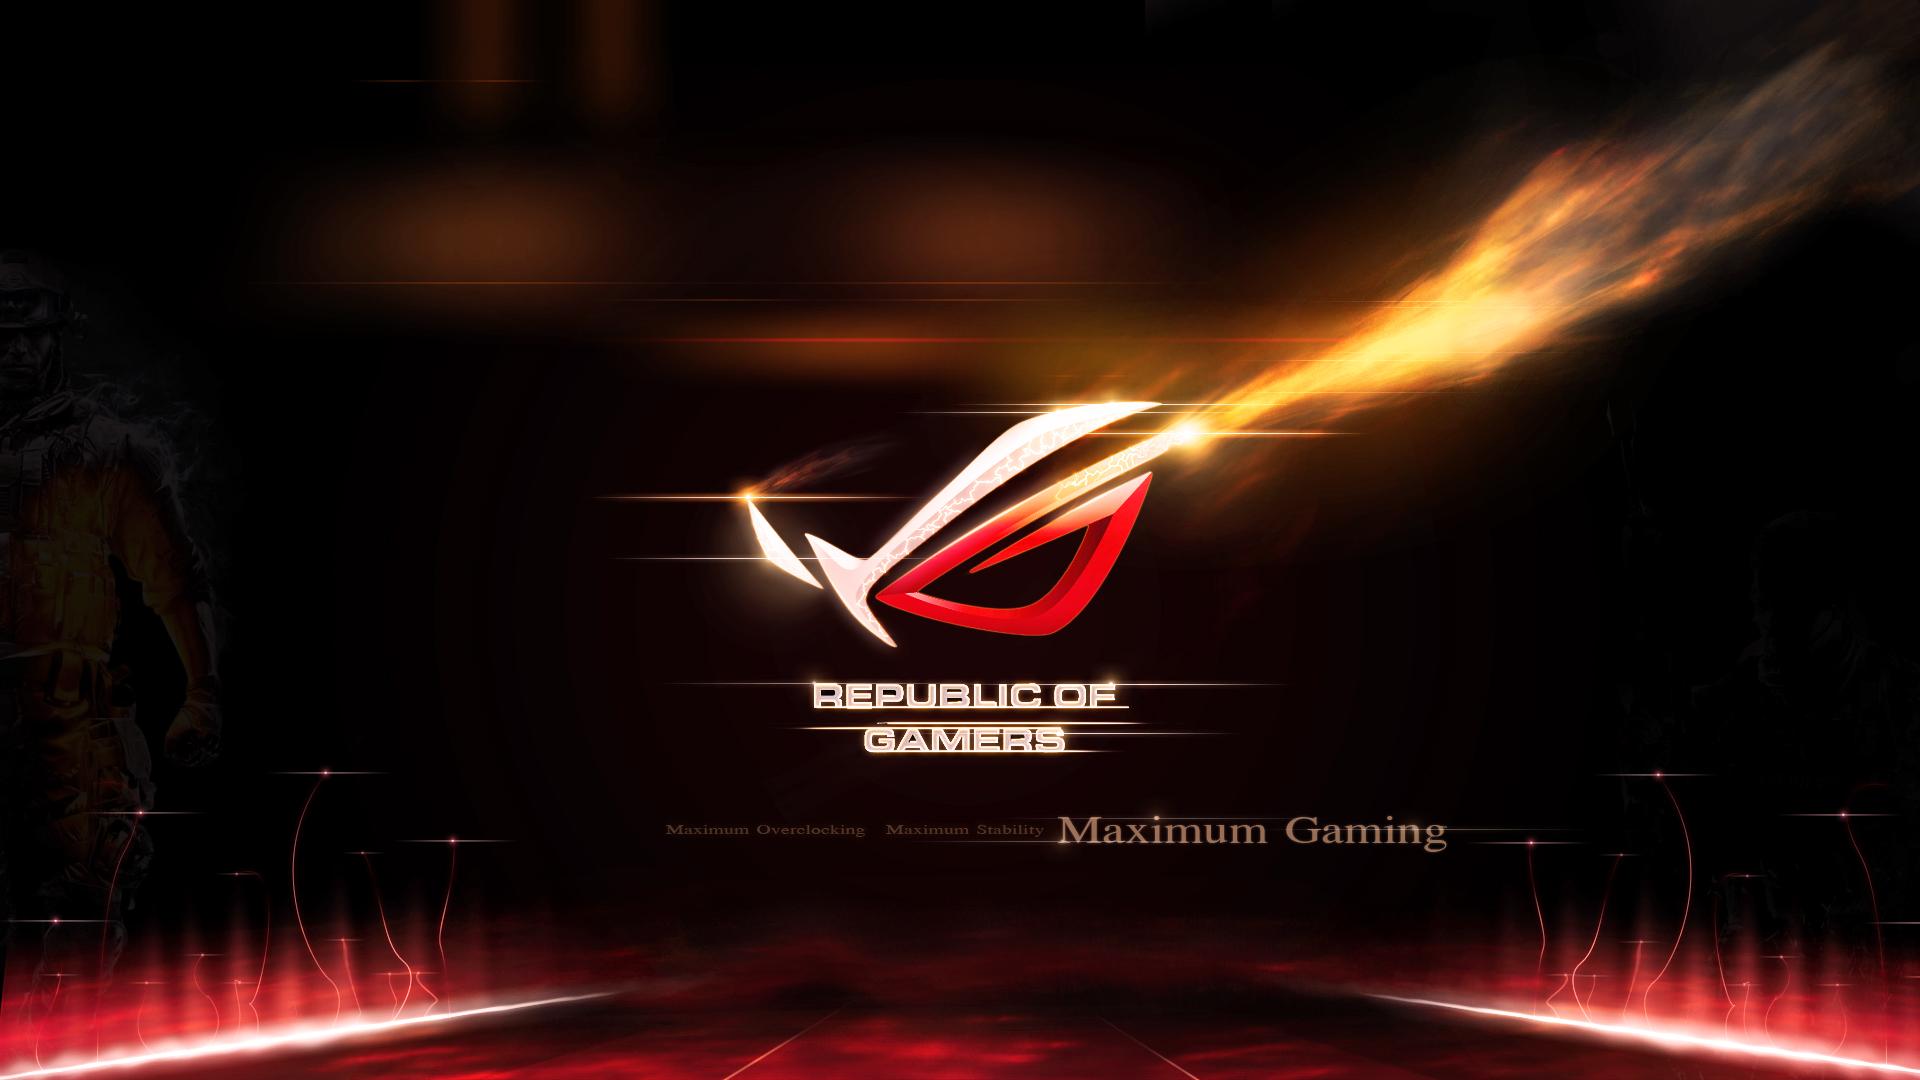 Pics photos rog blue background republic of gamers asus gamer asus - Asus Rog Wallpaper 1280x1024 Wallpaper 1112744